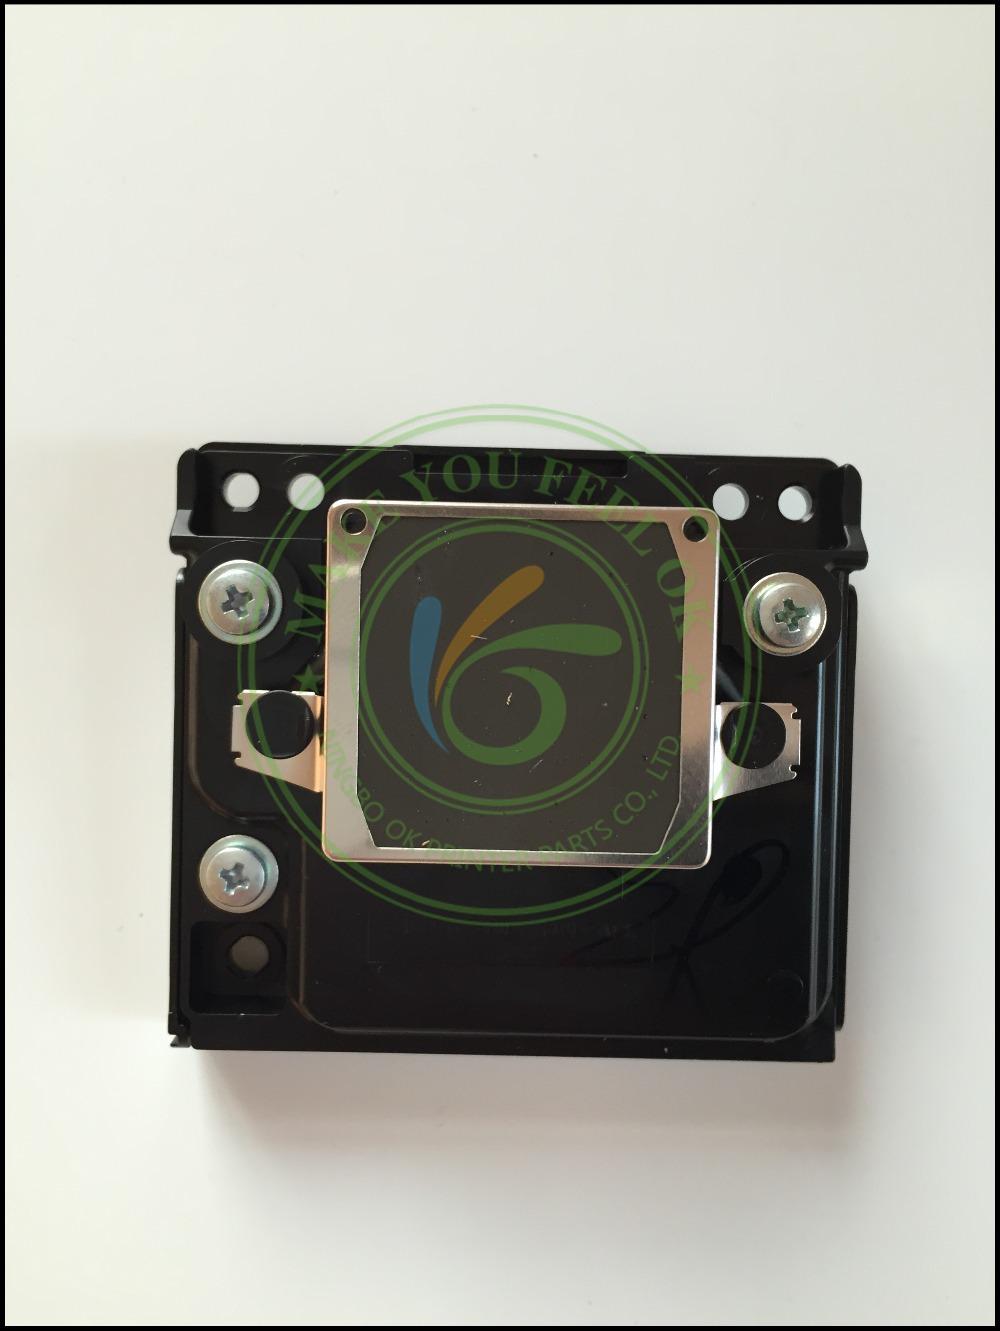 ORIGINAL F155040 F182000 F168020 Printhead for Epson R250 RX430 RX530 Photo20 CX3500 CX3650 CX6900F CX4900 CX5900 CX9300F TX400(China (Mainland))